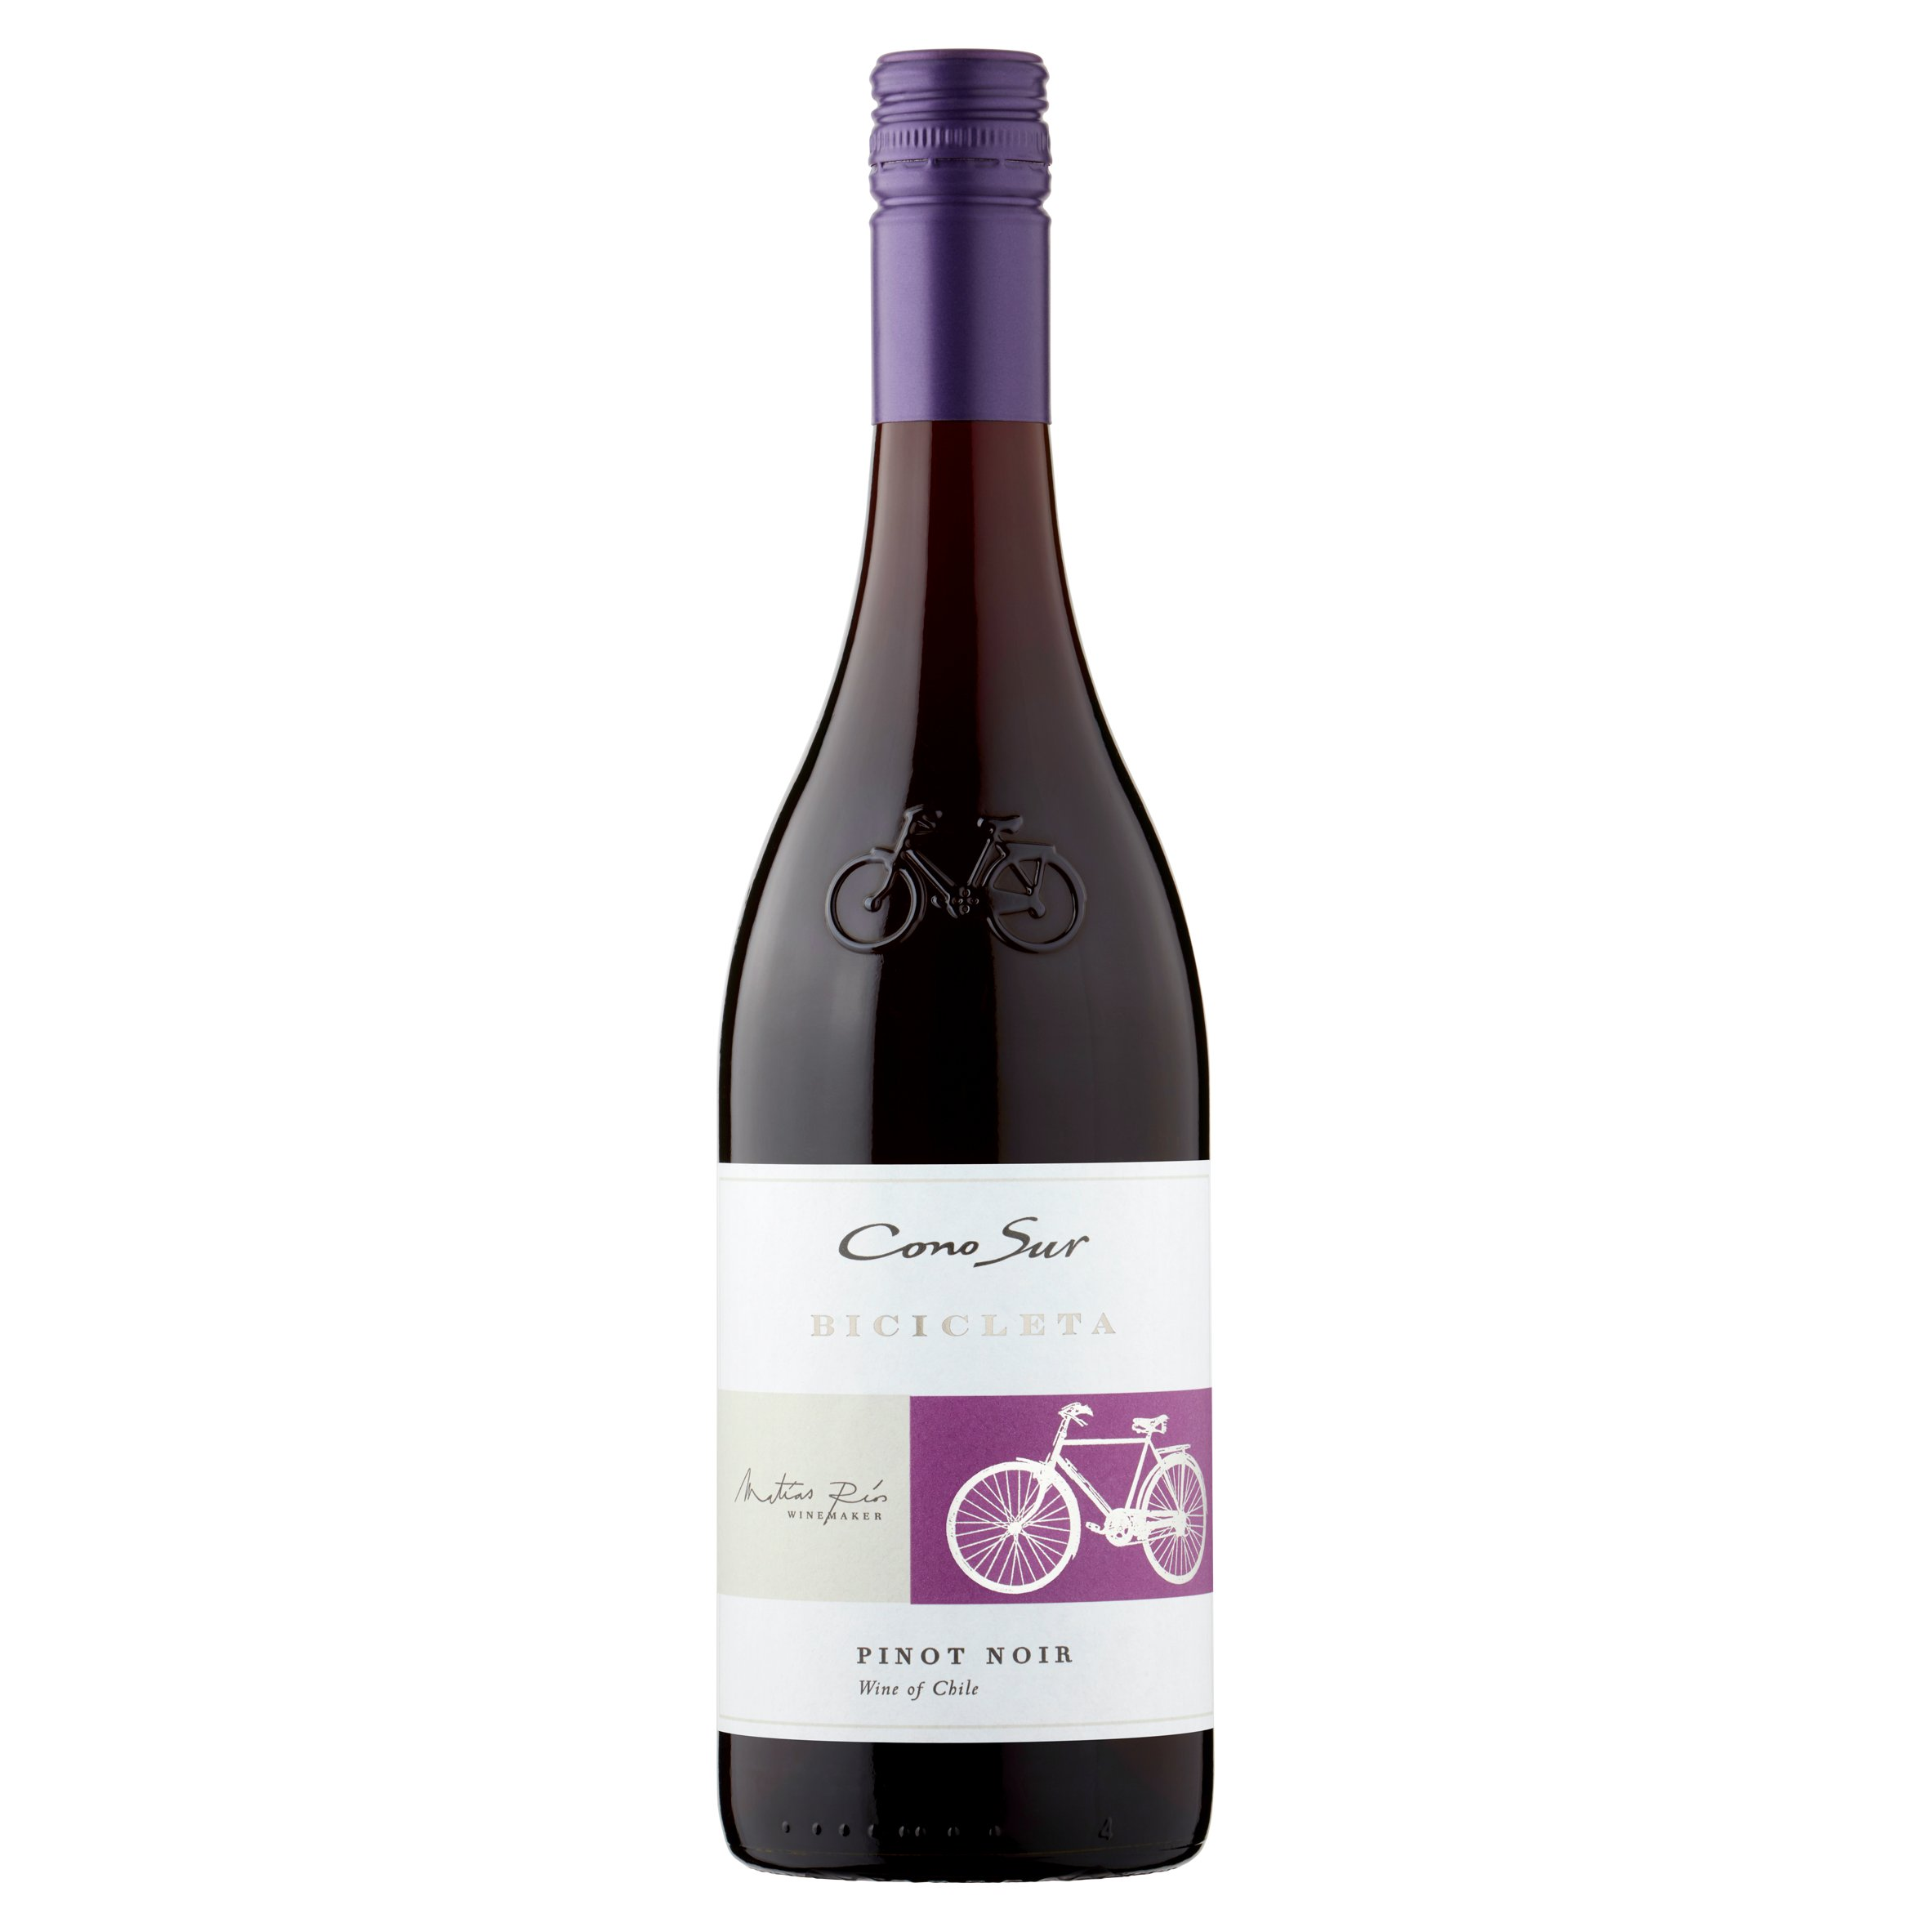 Cono Sur Bicicleta Pinot Noir 75Cl